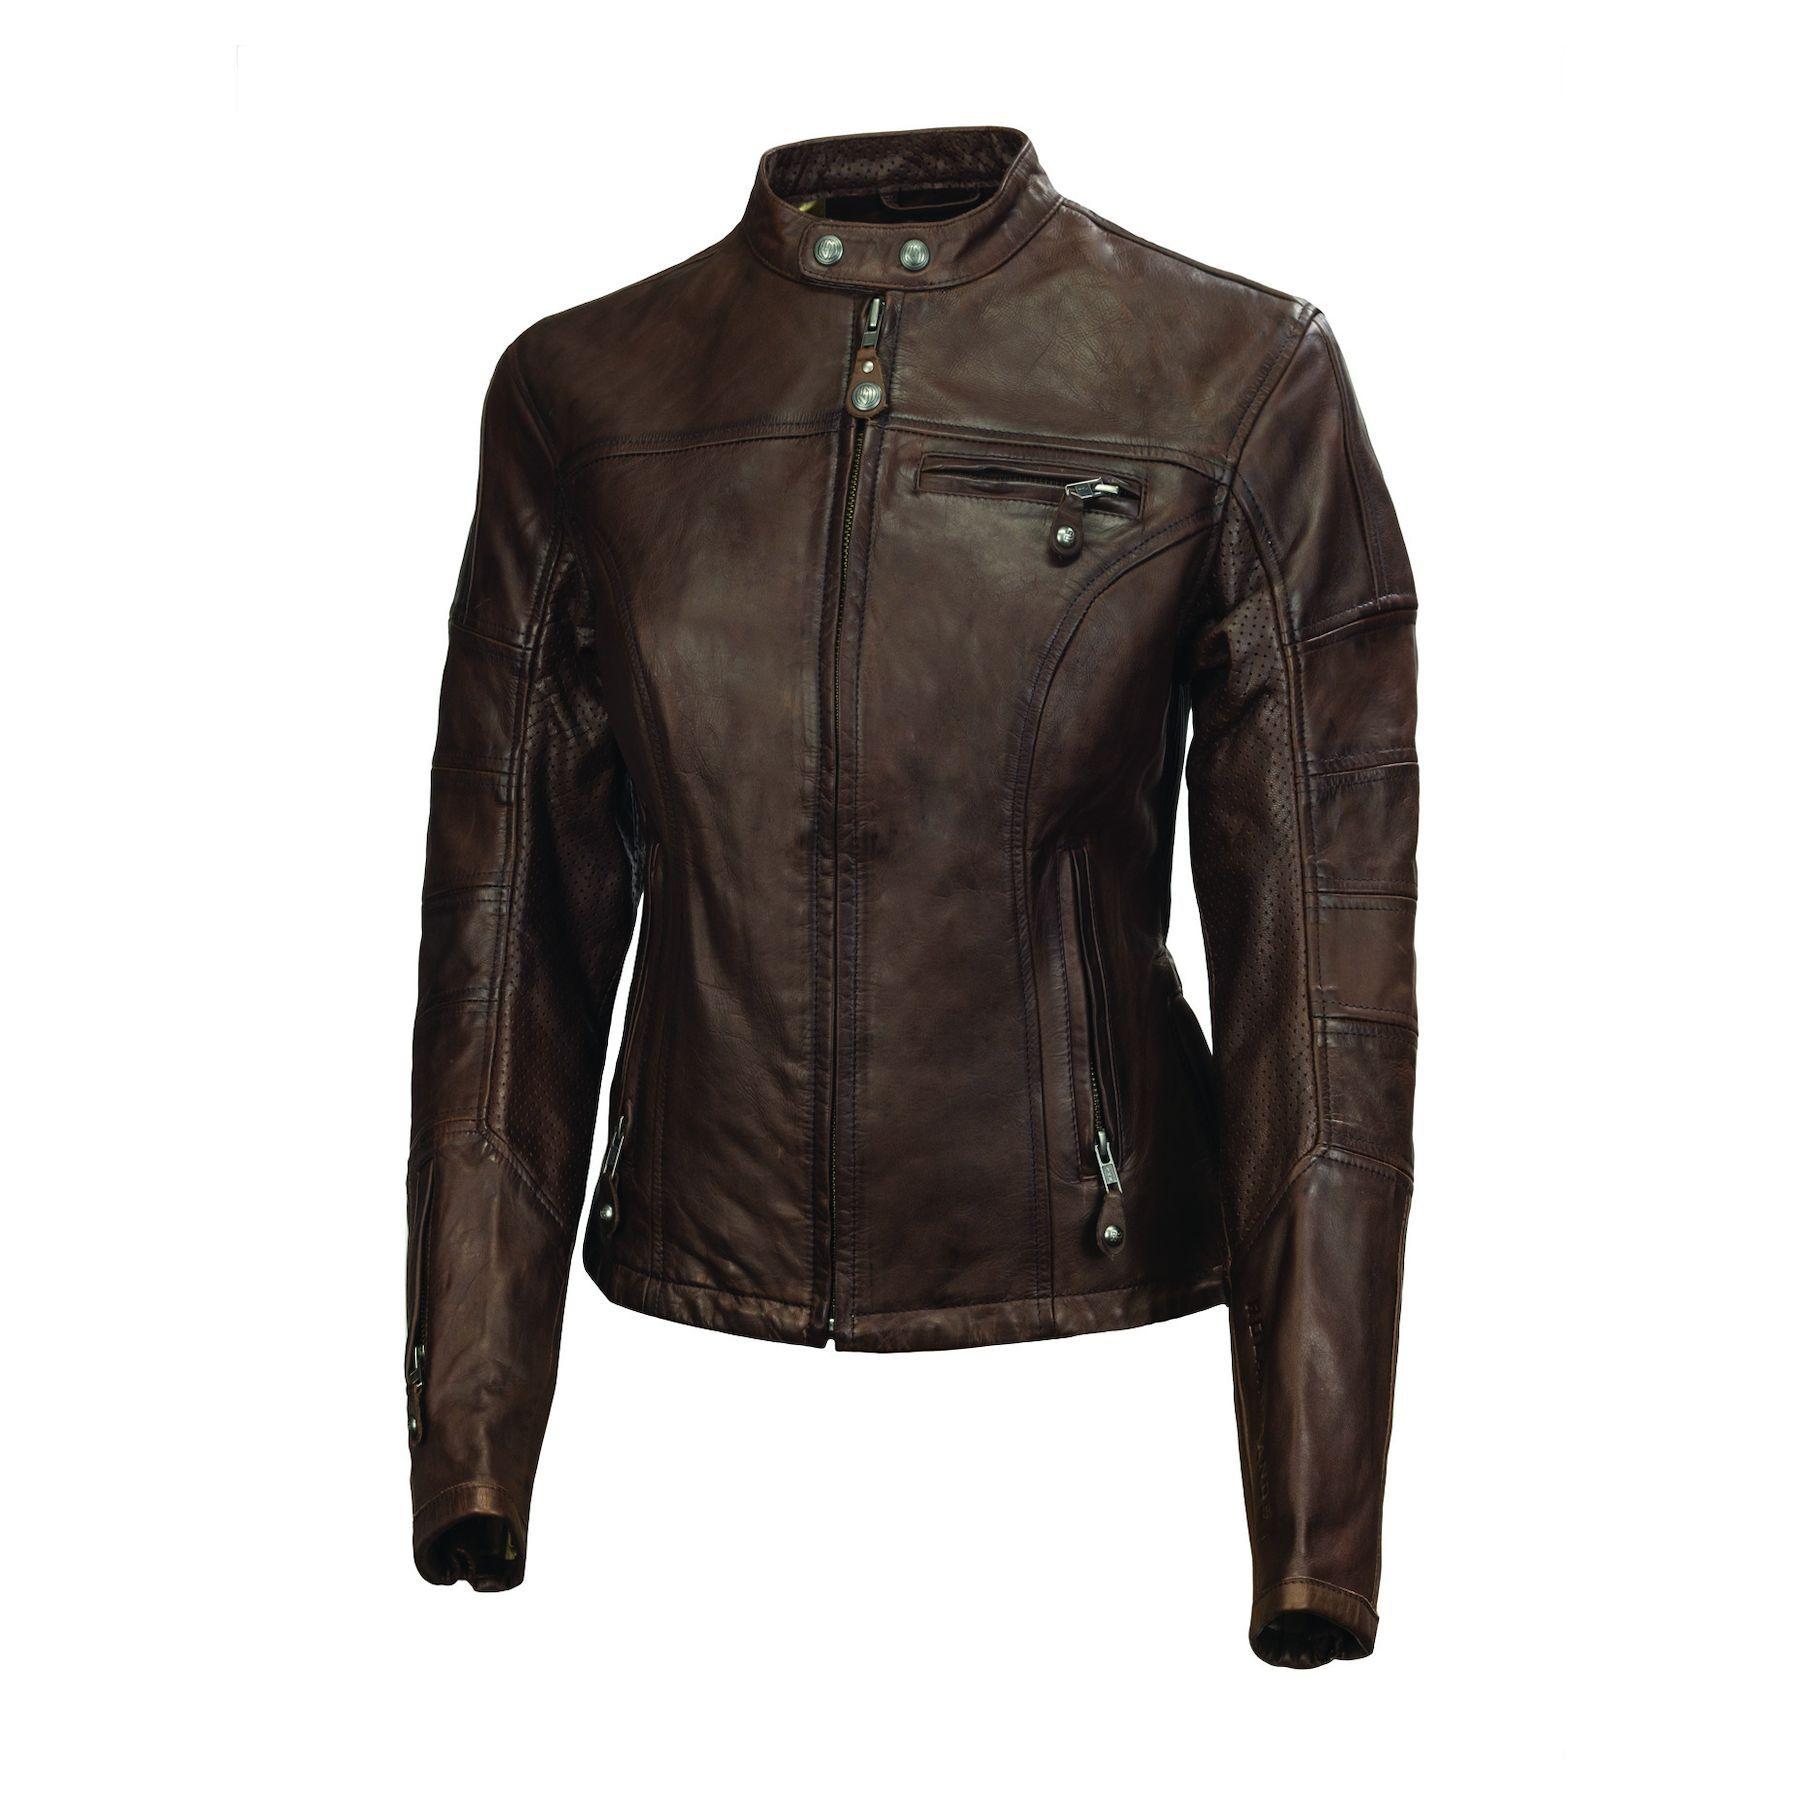 Roland Sands Maven Women S Leather Jacket Revzilla Leather Jackets Women Leather Jacket Leather Jacket Women Brown [ 1800 x 1800 Pixel ]